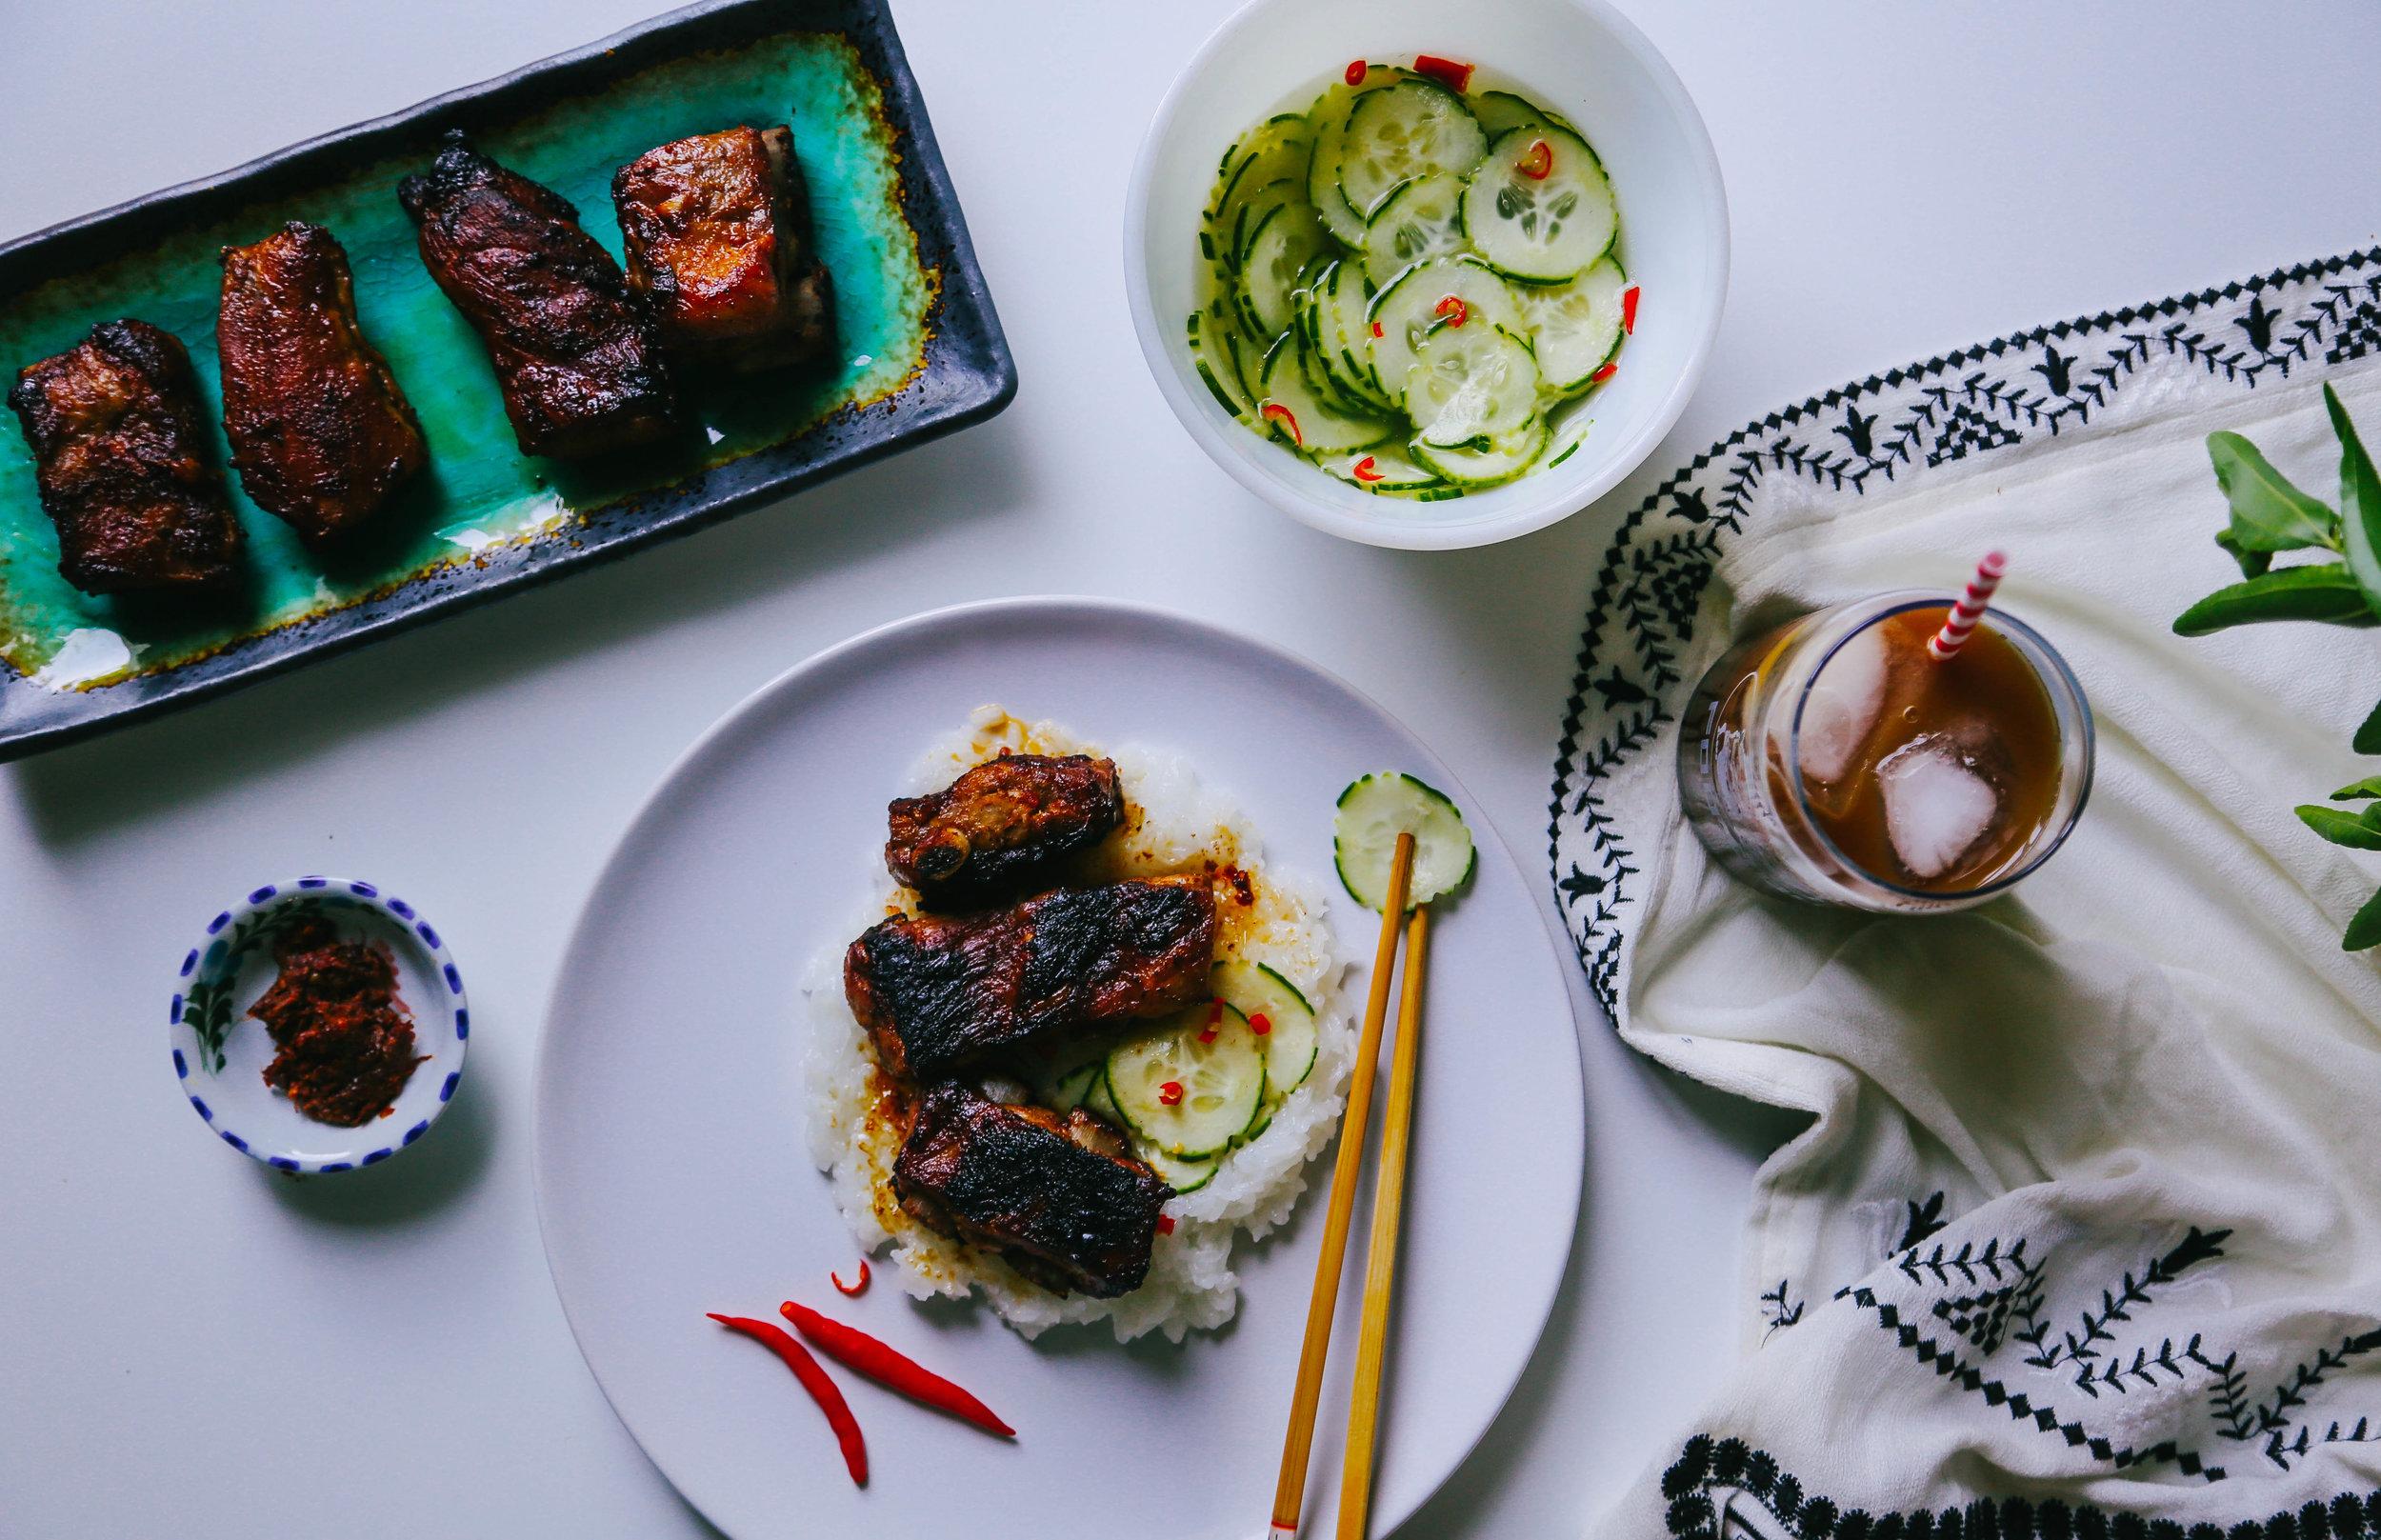 jaew bong ribs and cucumber salad